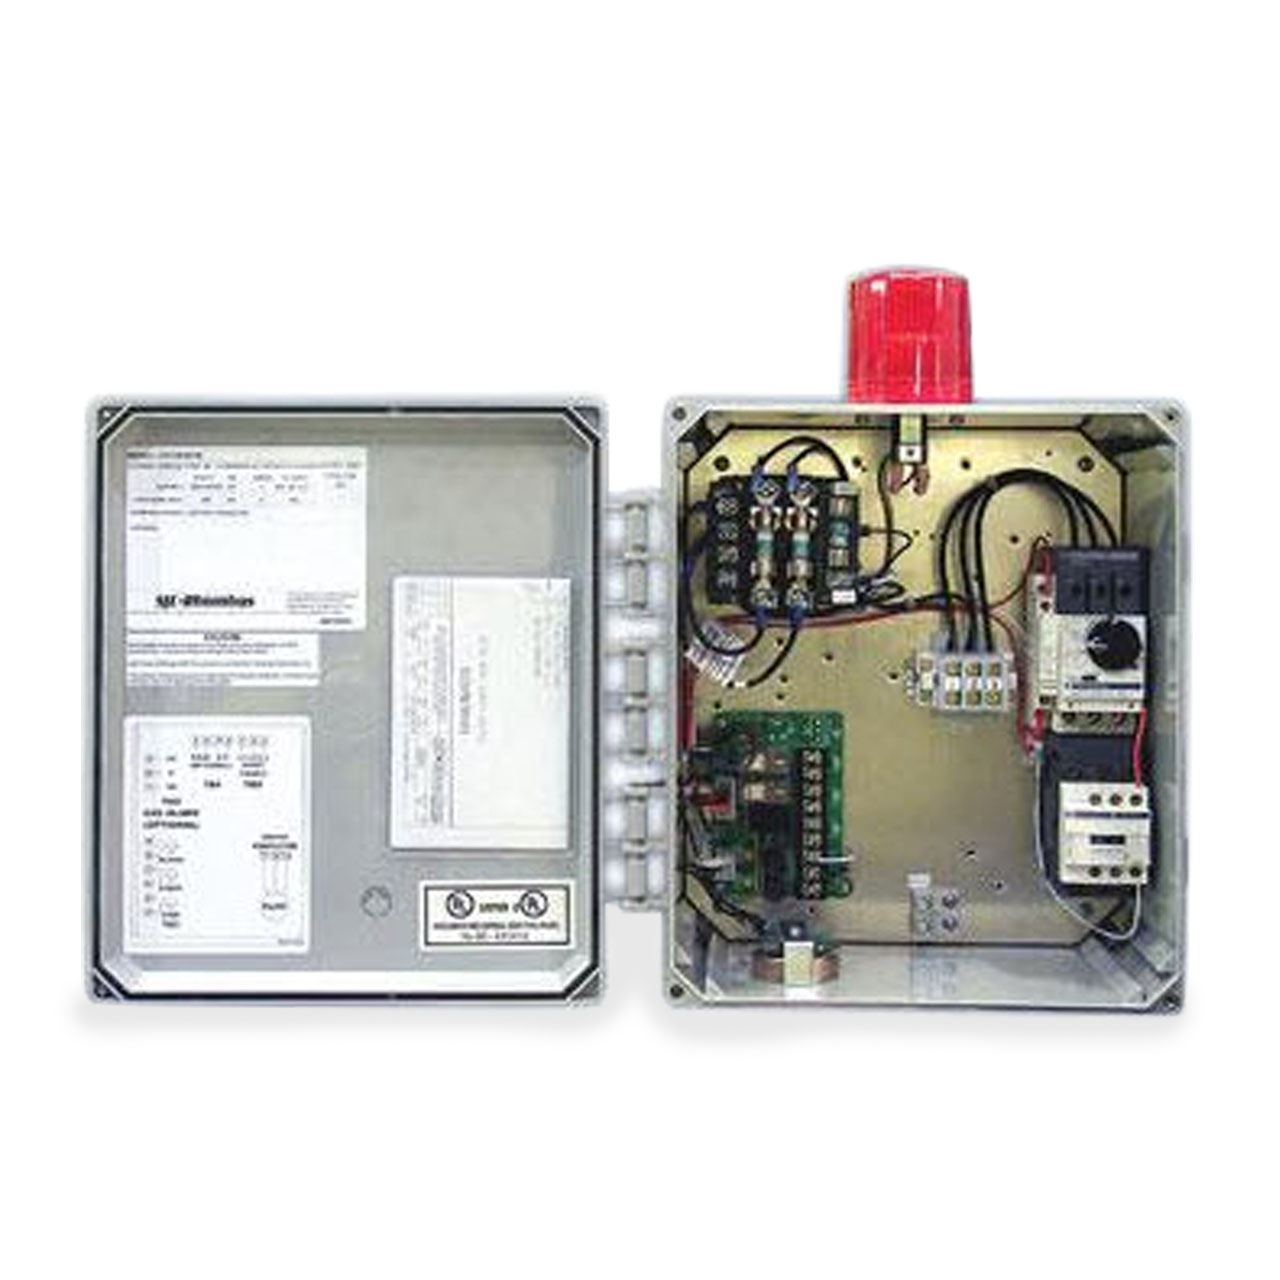 hight resolution of sje rhombus sje rhombus model 312 3 phase 208 240 480 600v simplexduplex motor starter wiring